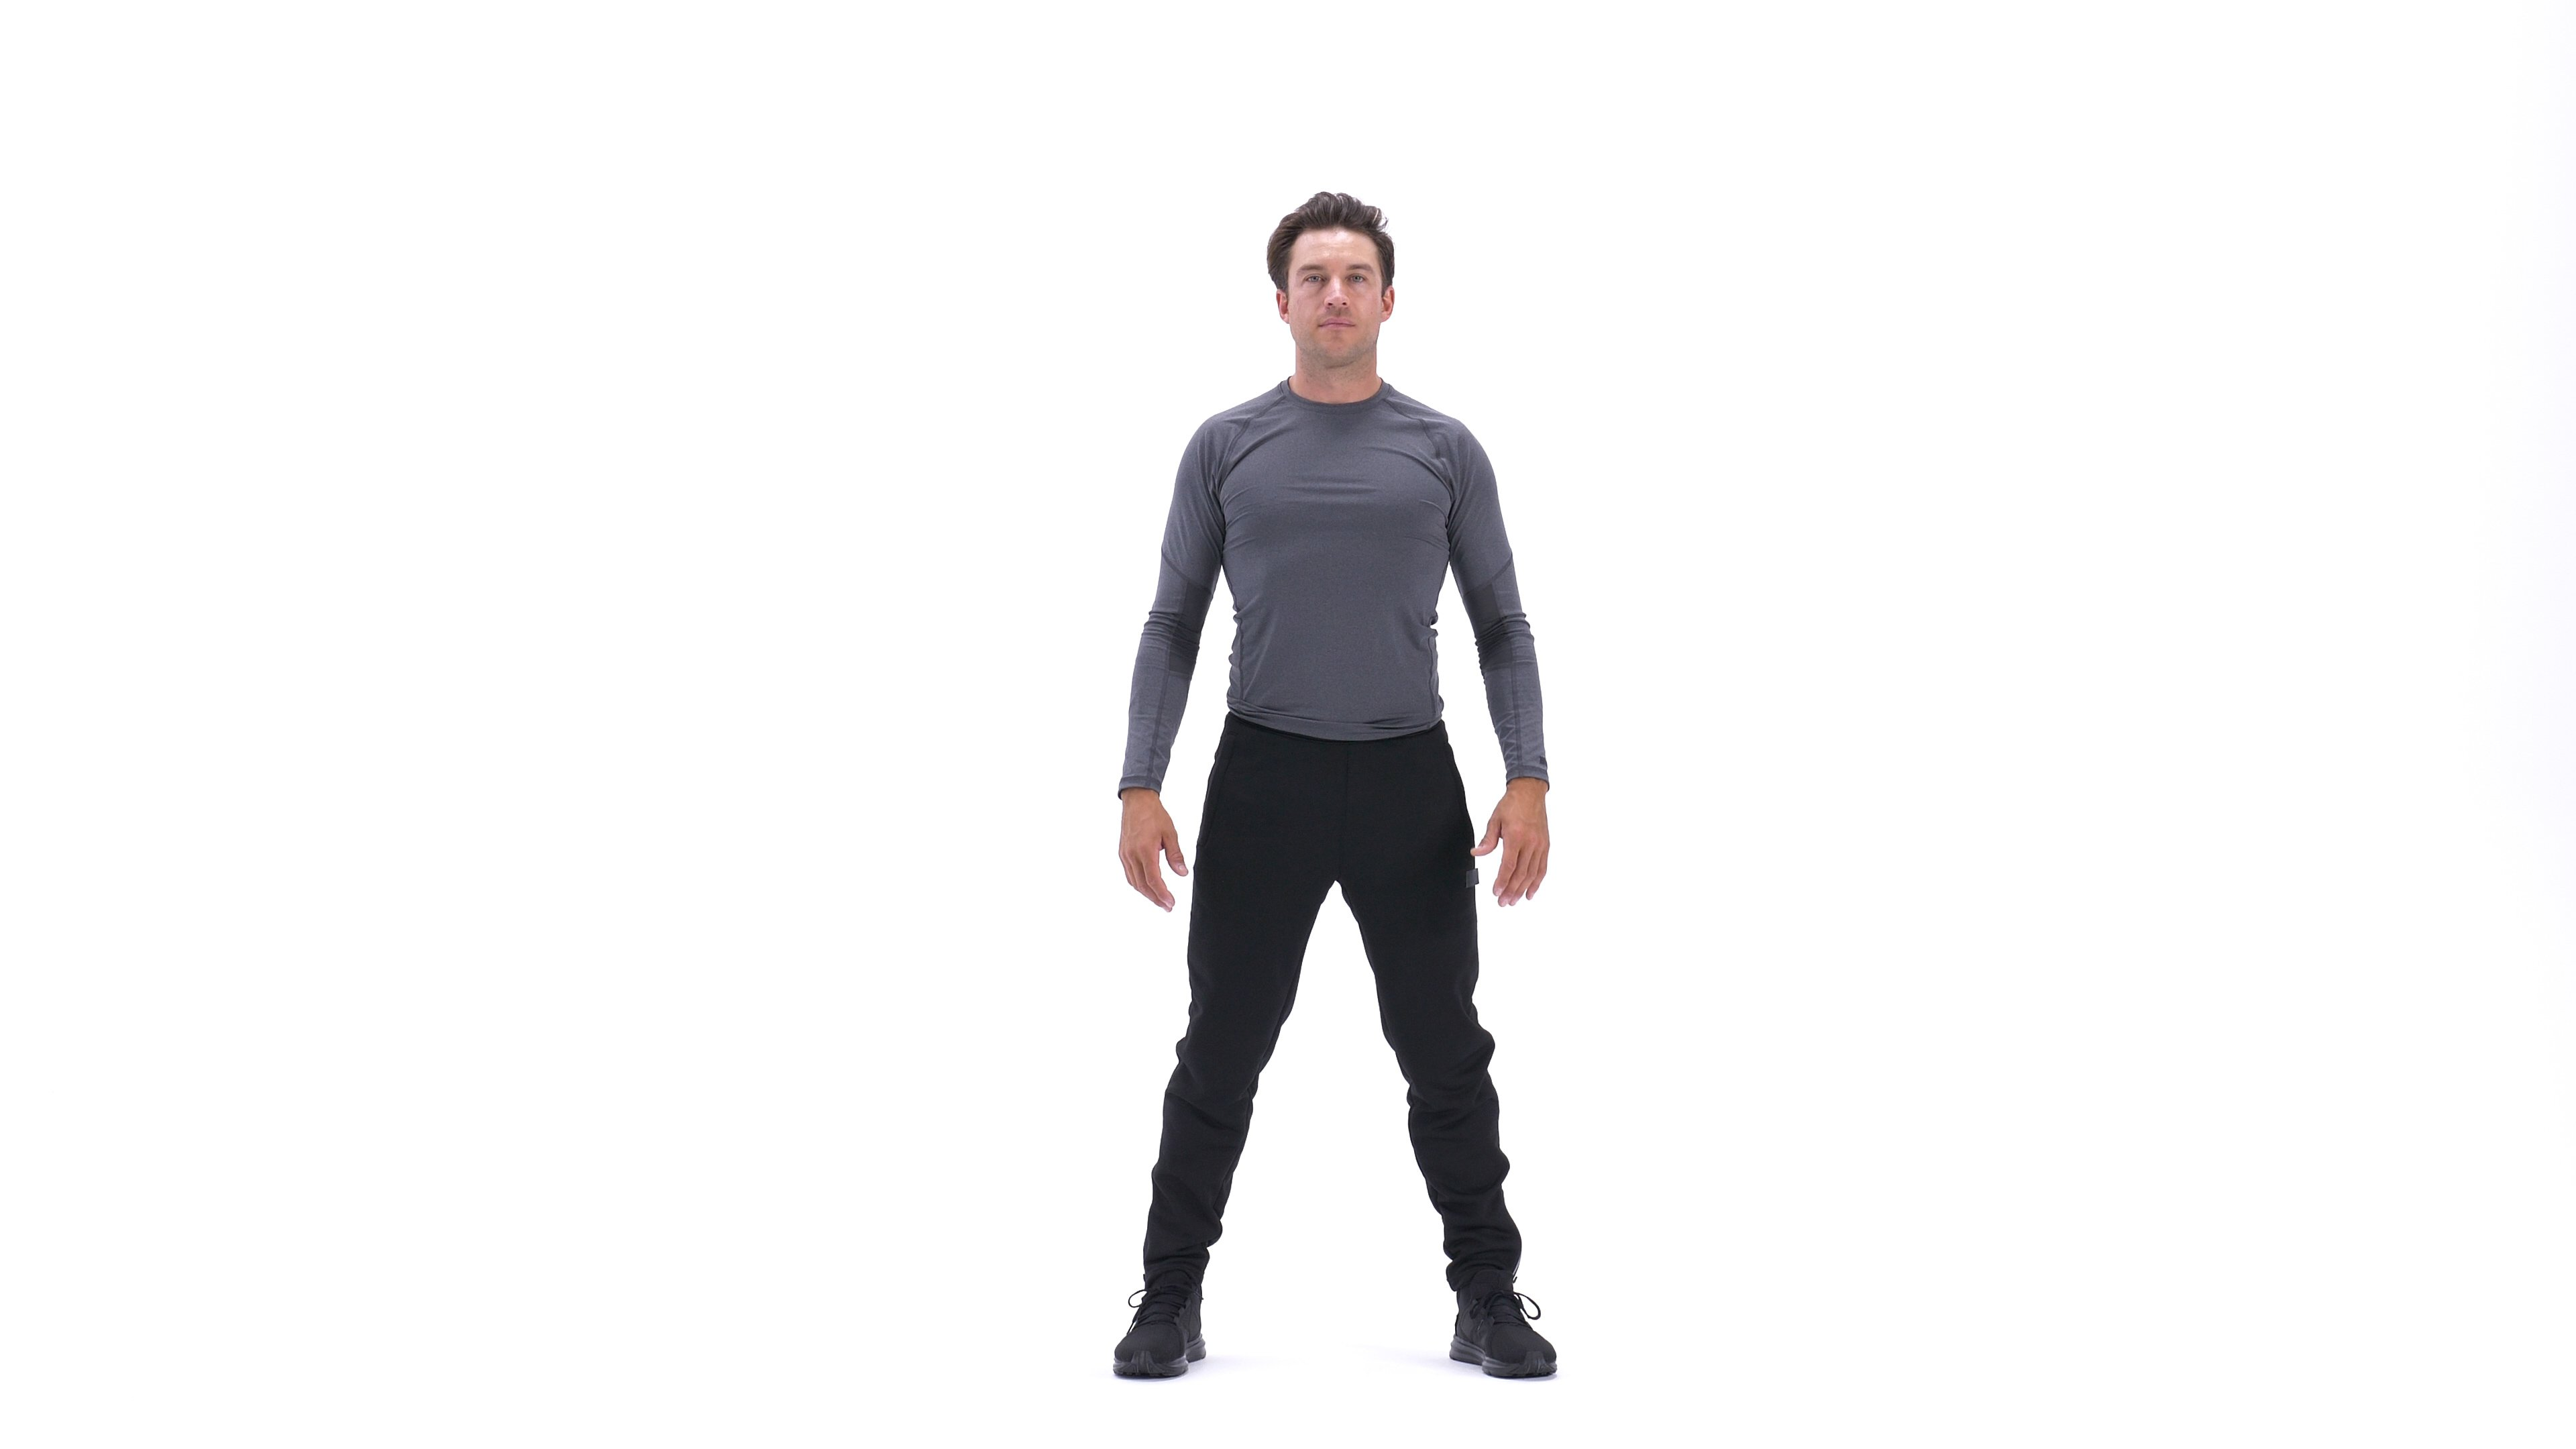 Bodyweight squat image